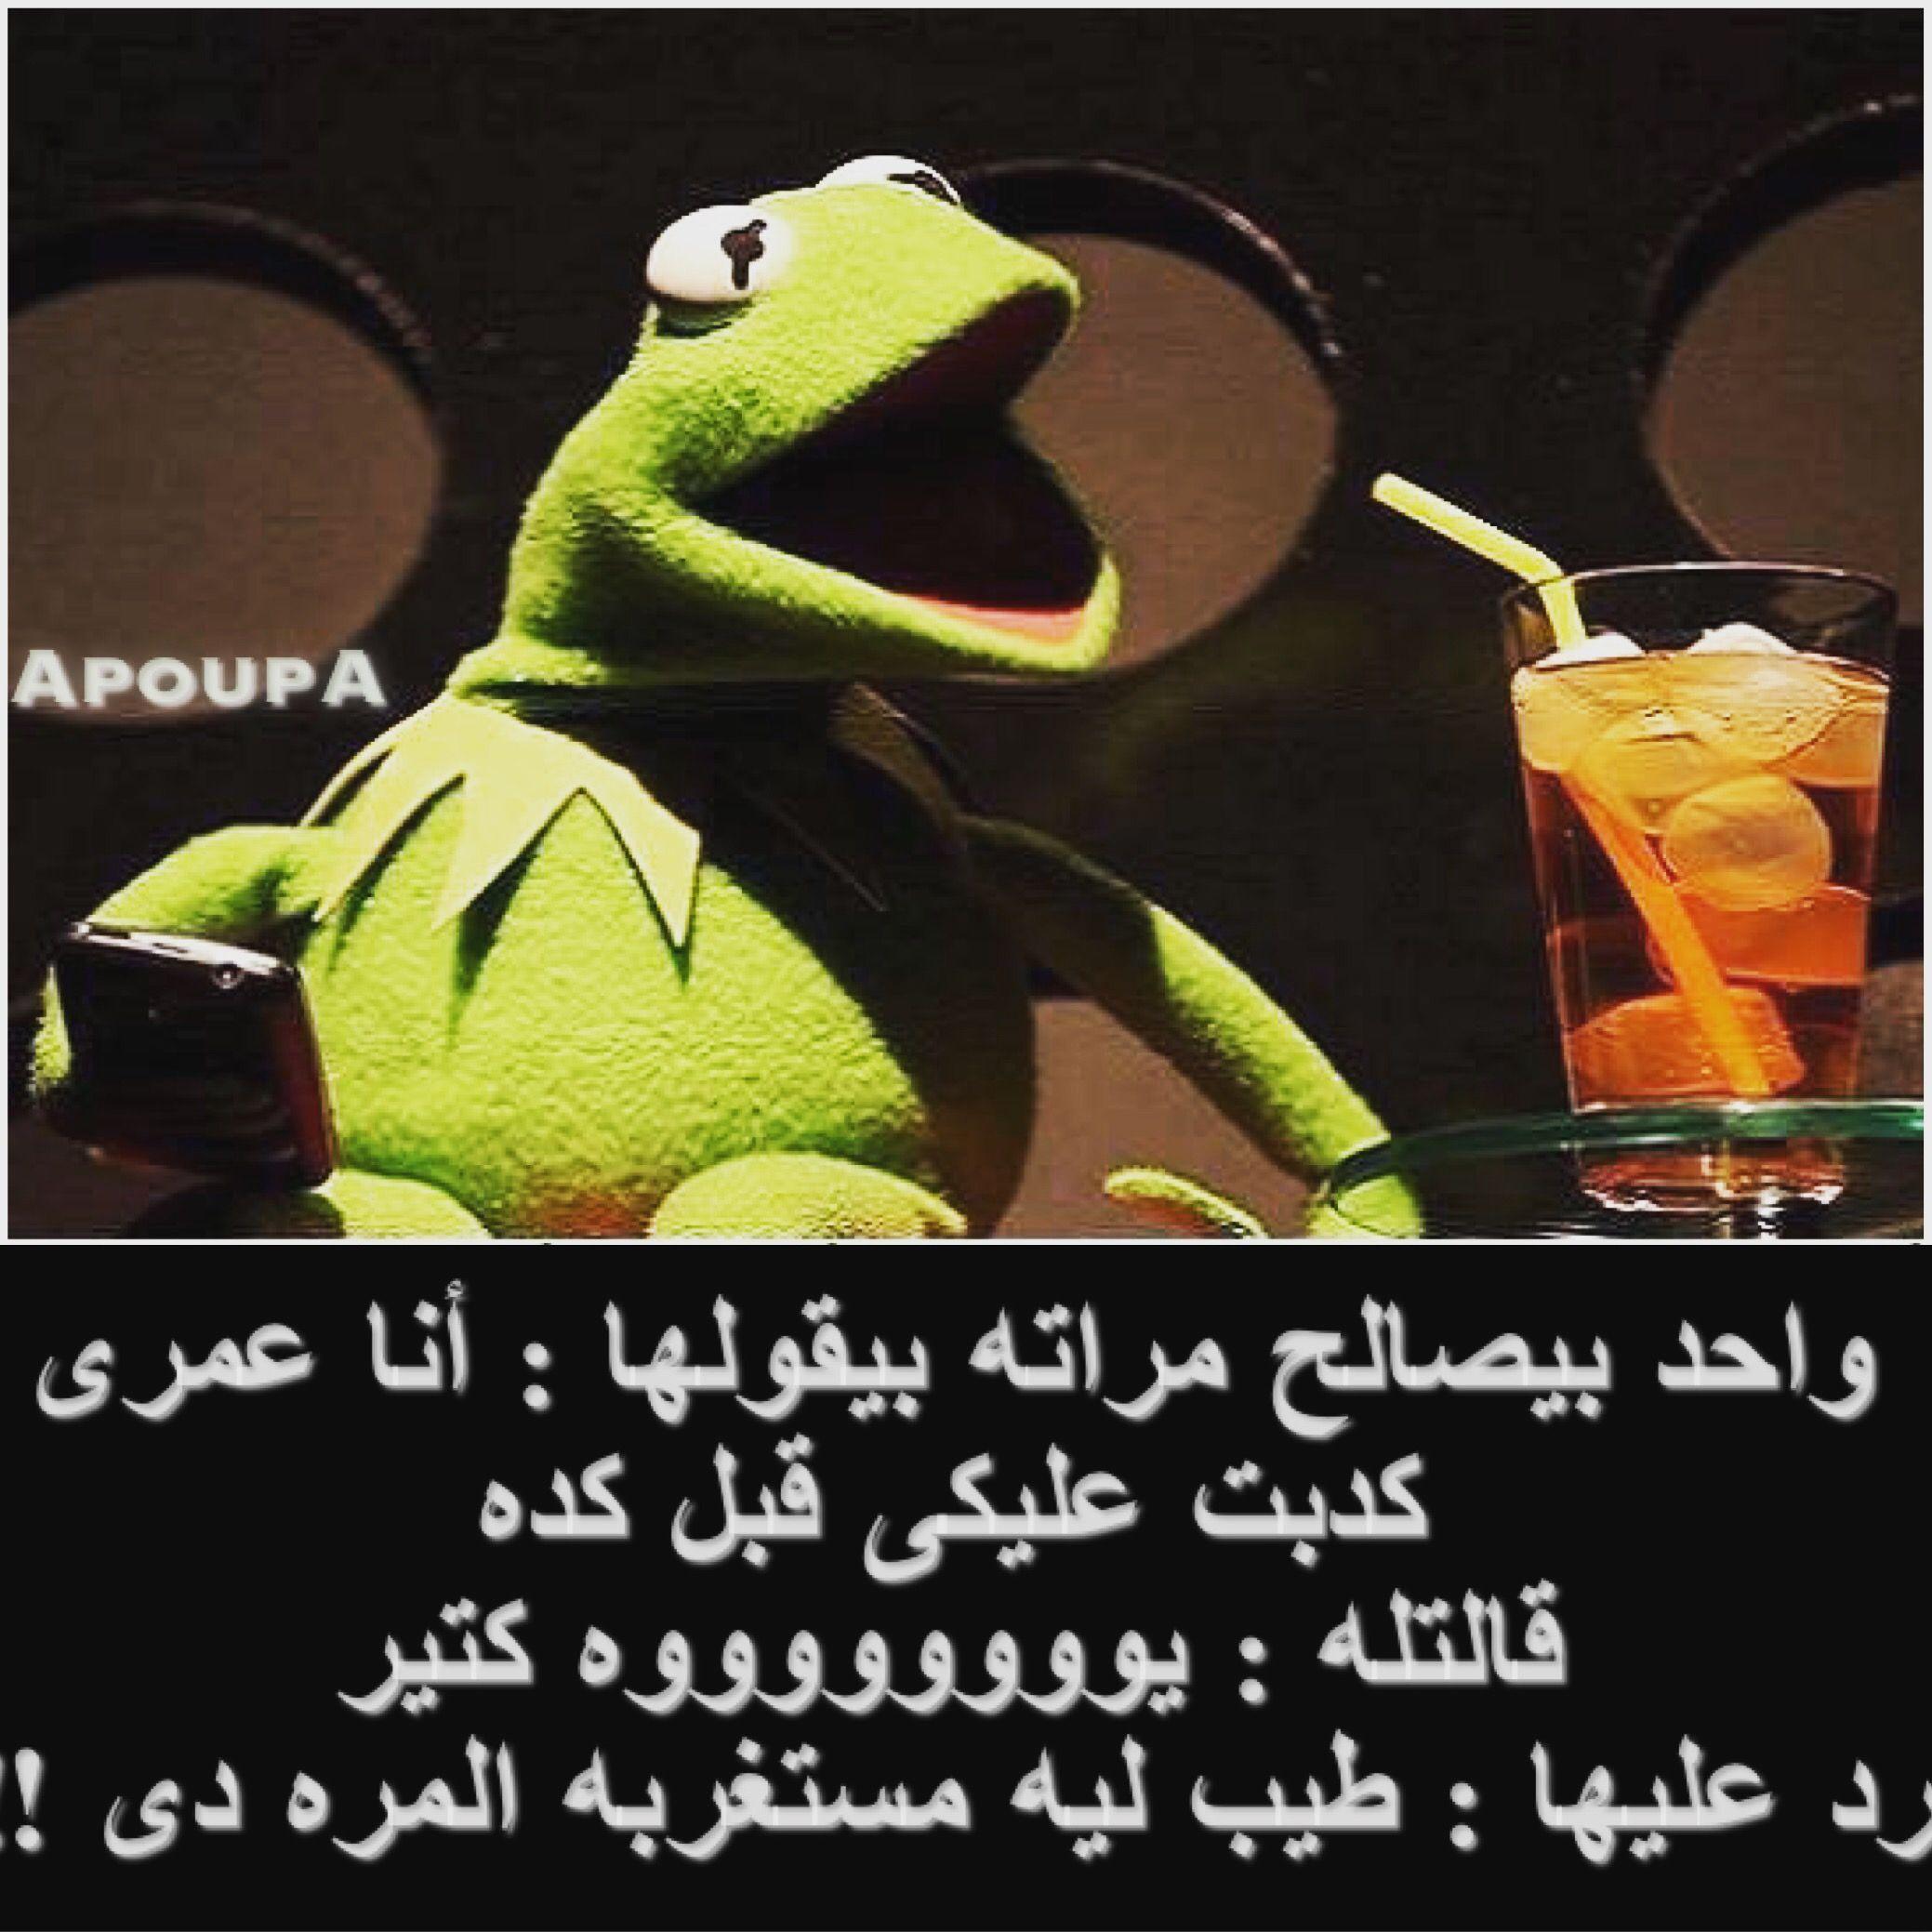 Pin By Vip 20 On إضحك وإنت ساكت Best Funny Jokes Arabic Funny Funny Words